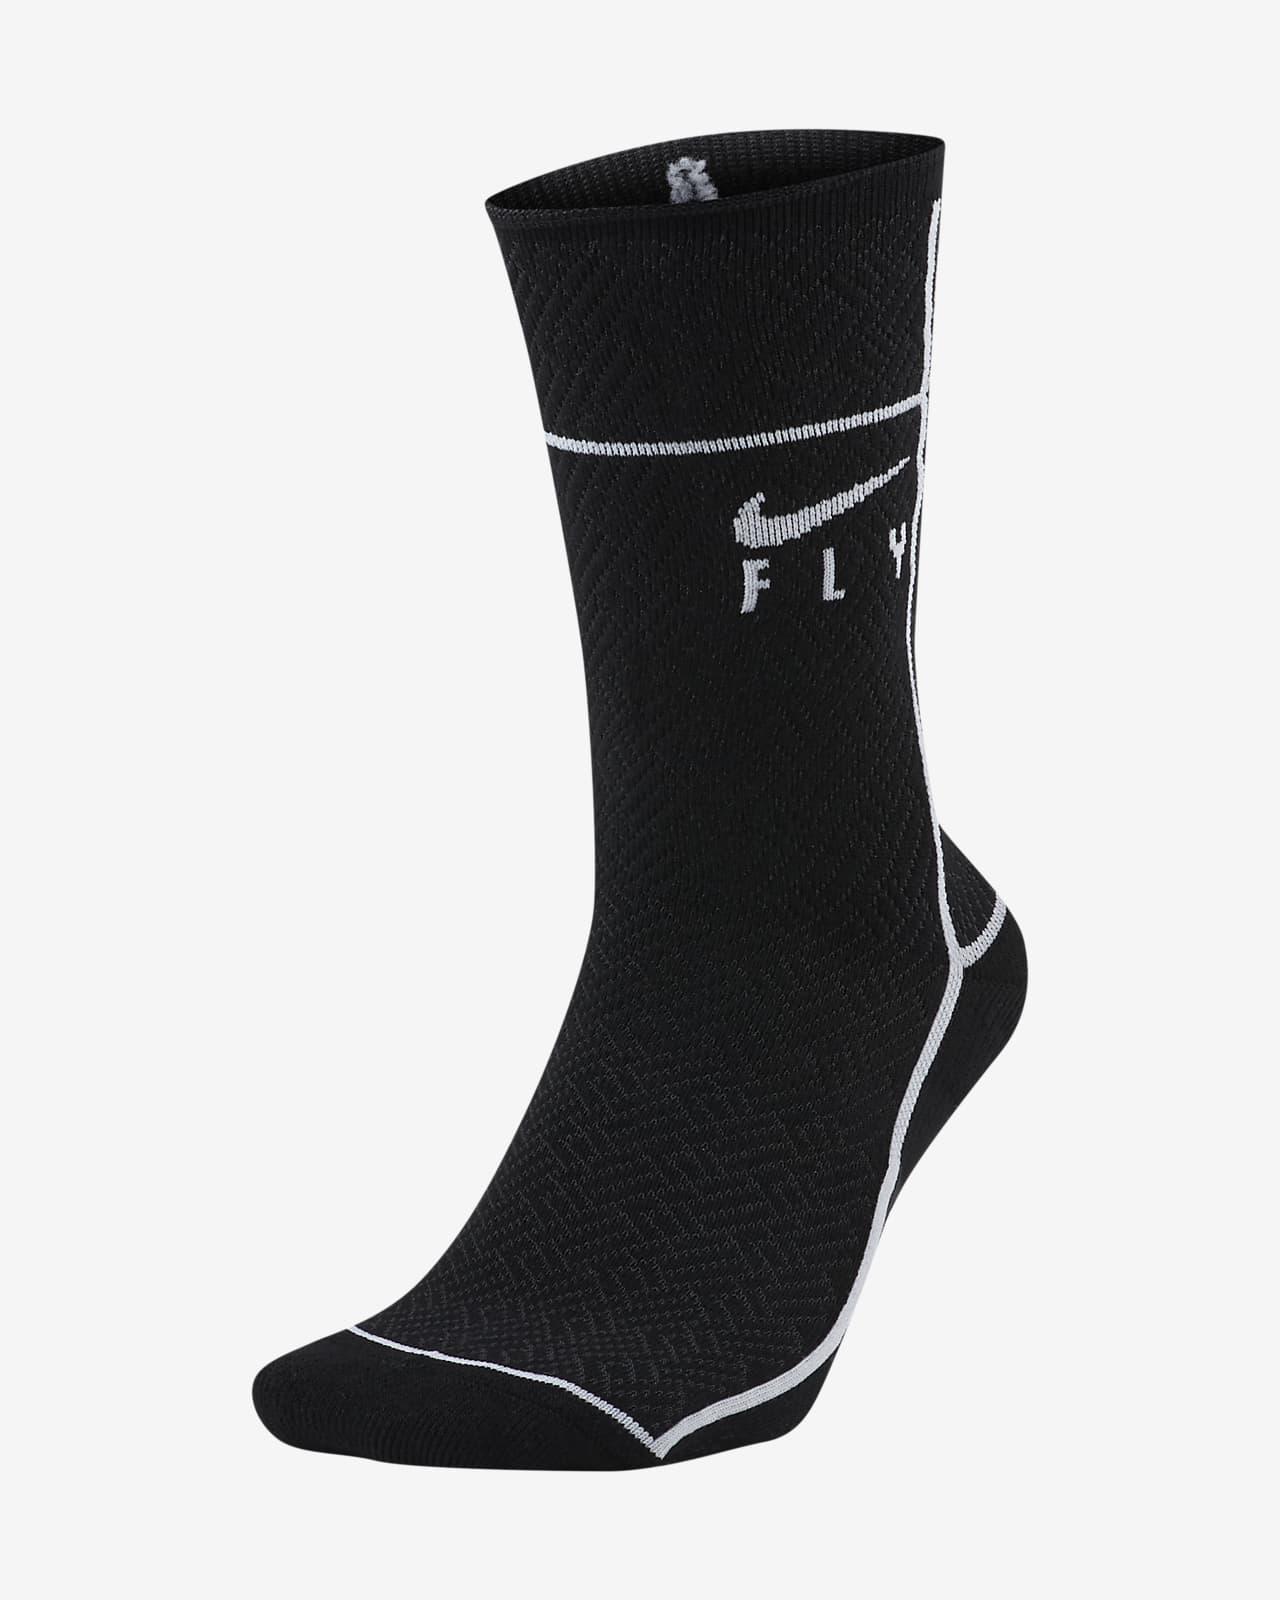 Nike SNKR SOX Swoosh Fly Basketball Crew Socks